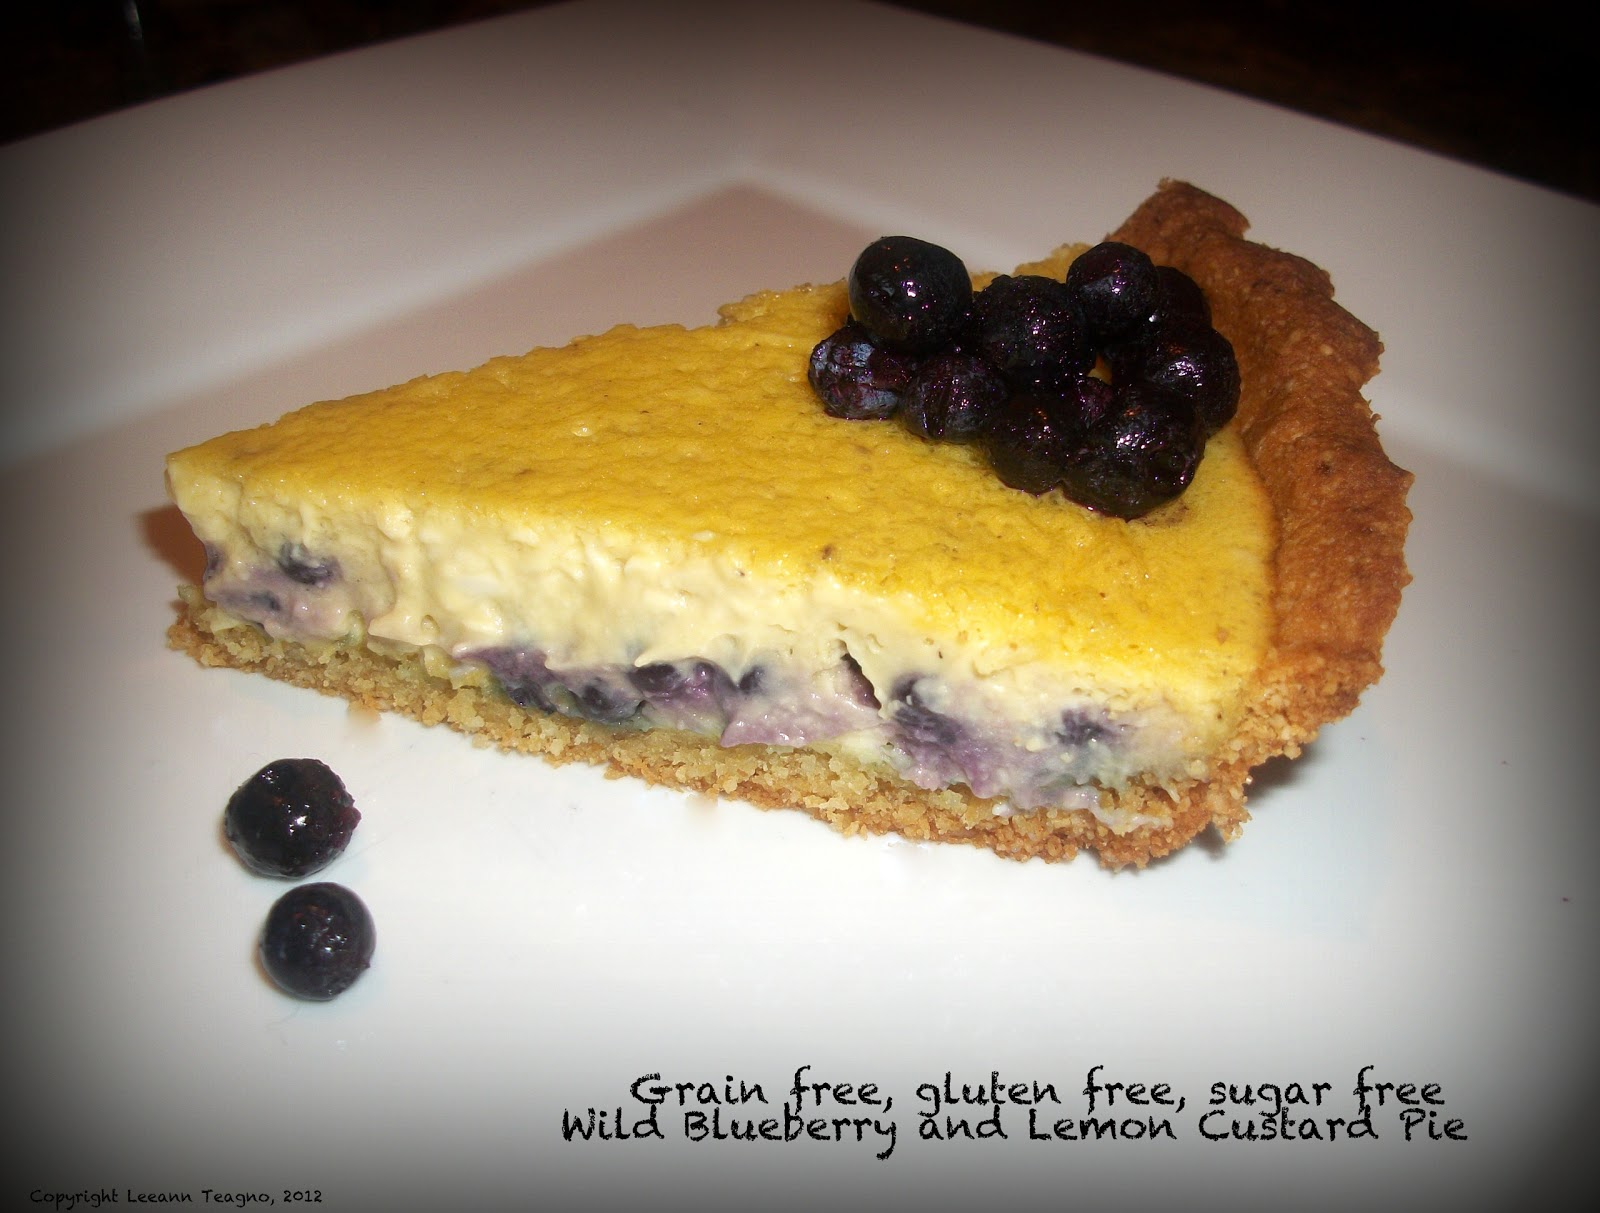 (Almost?) Grain free, gluten free, sugar free Wild ...